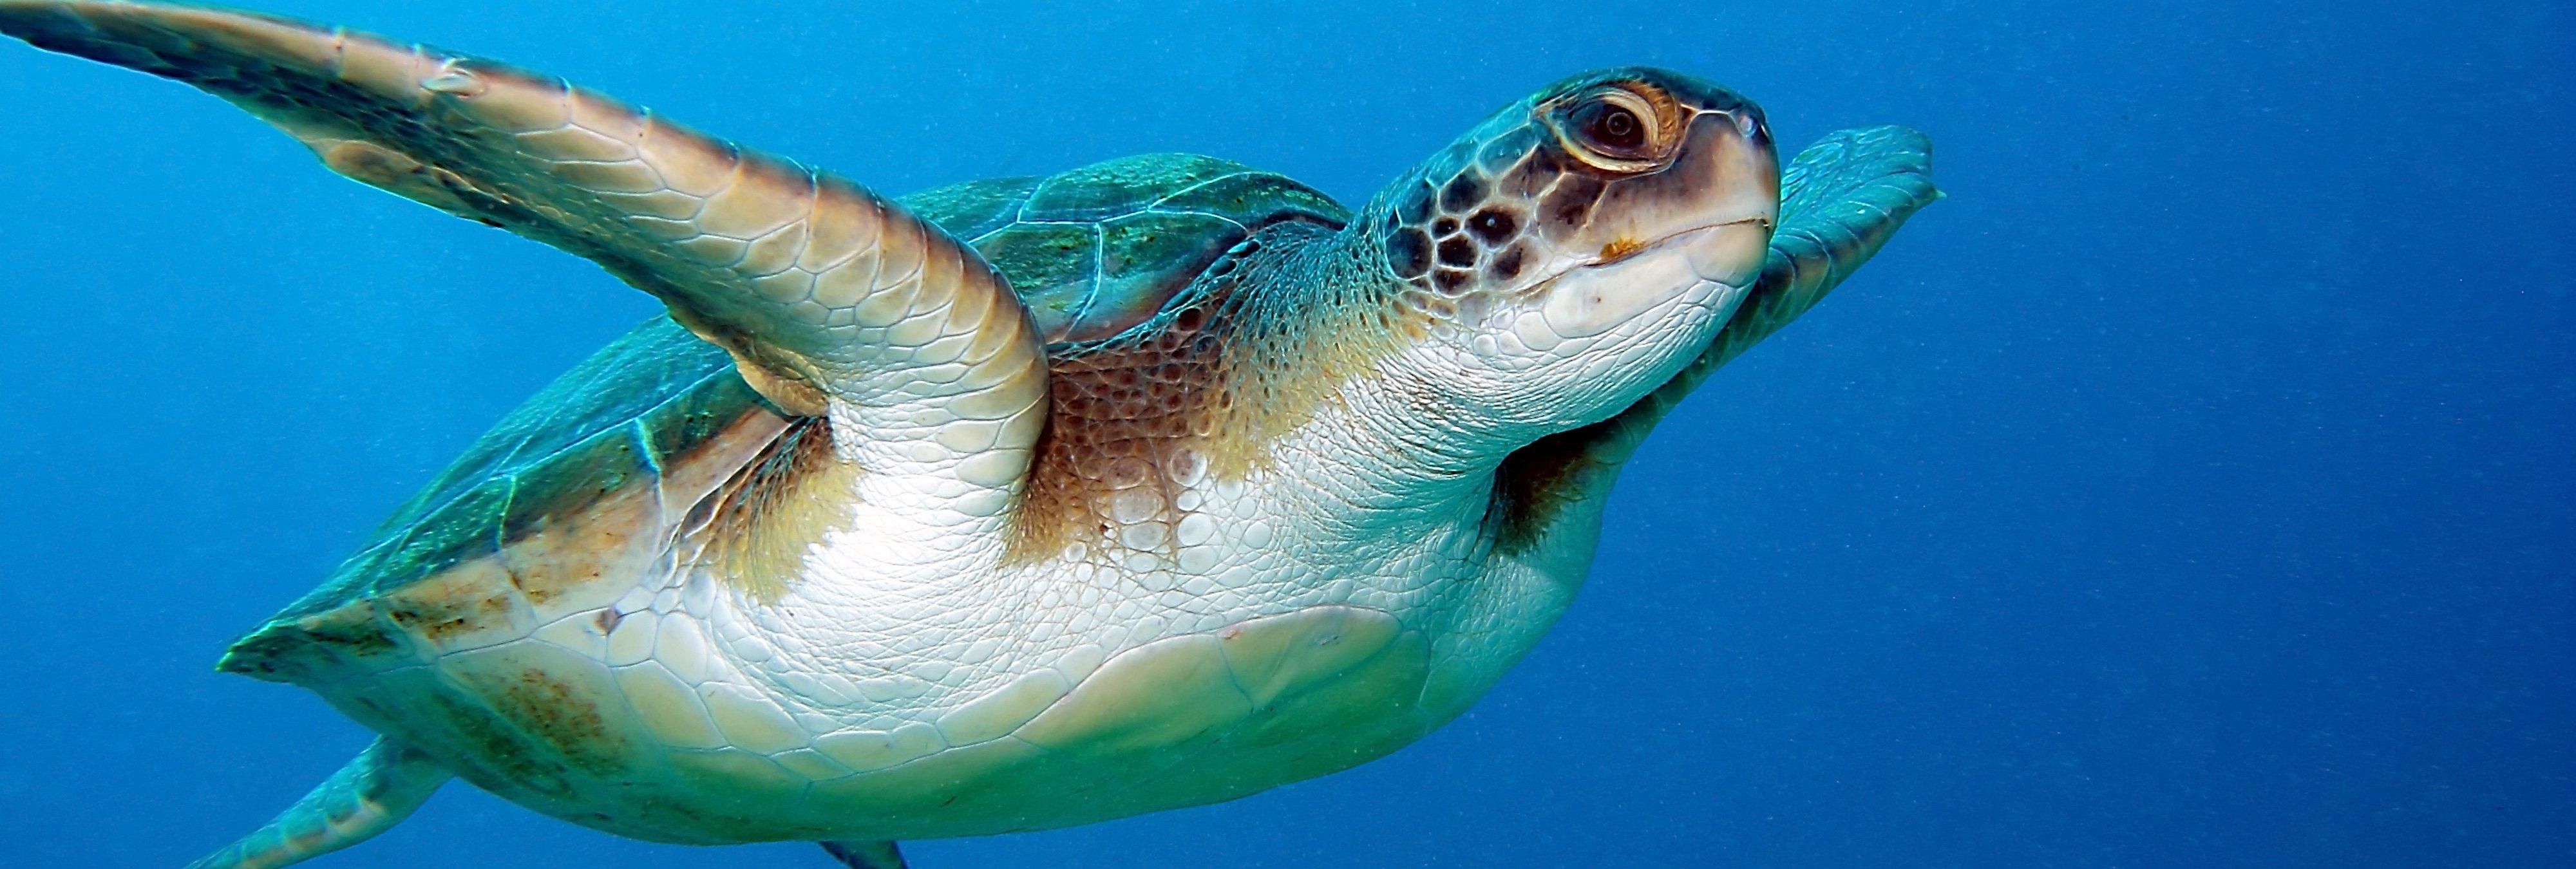 Montan una tortuga laúd: un nuevo caso de terrible maltrato animal